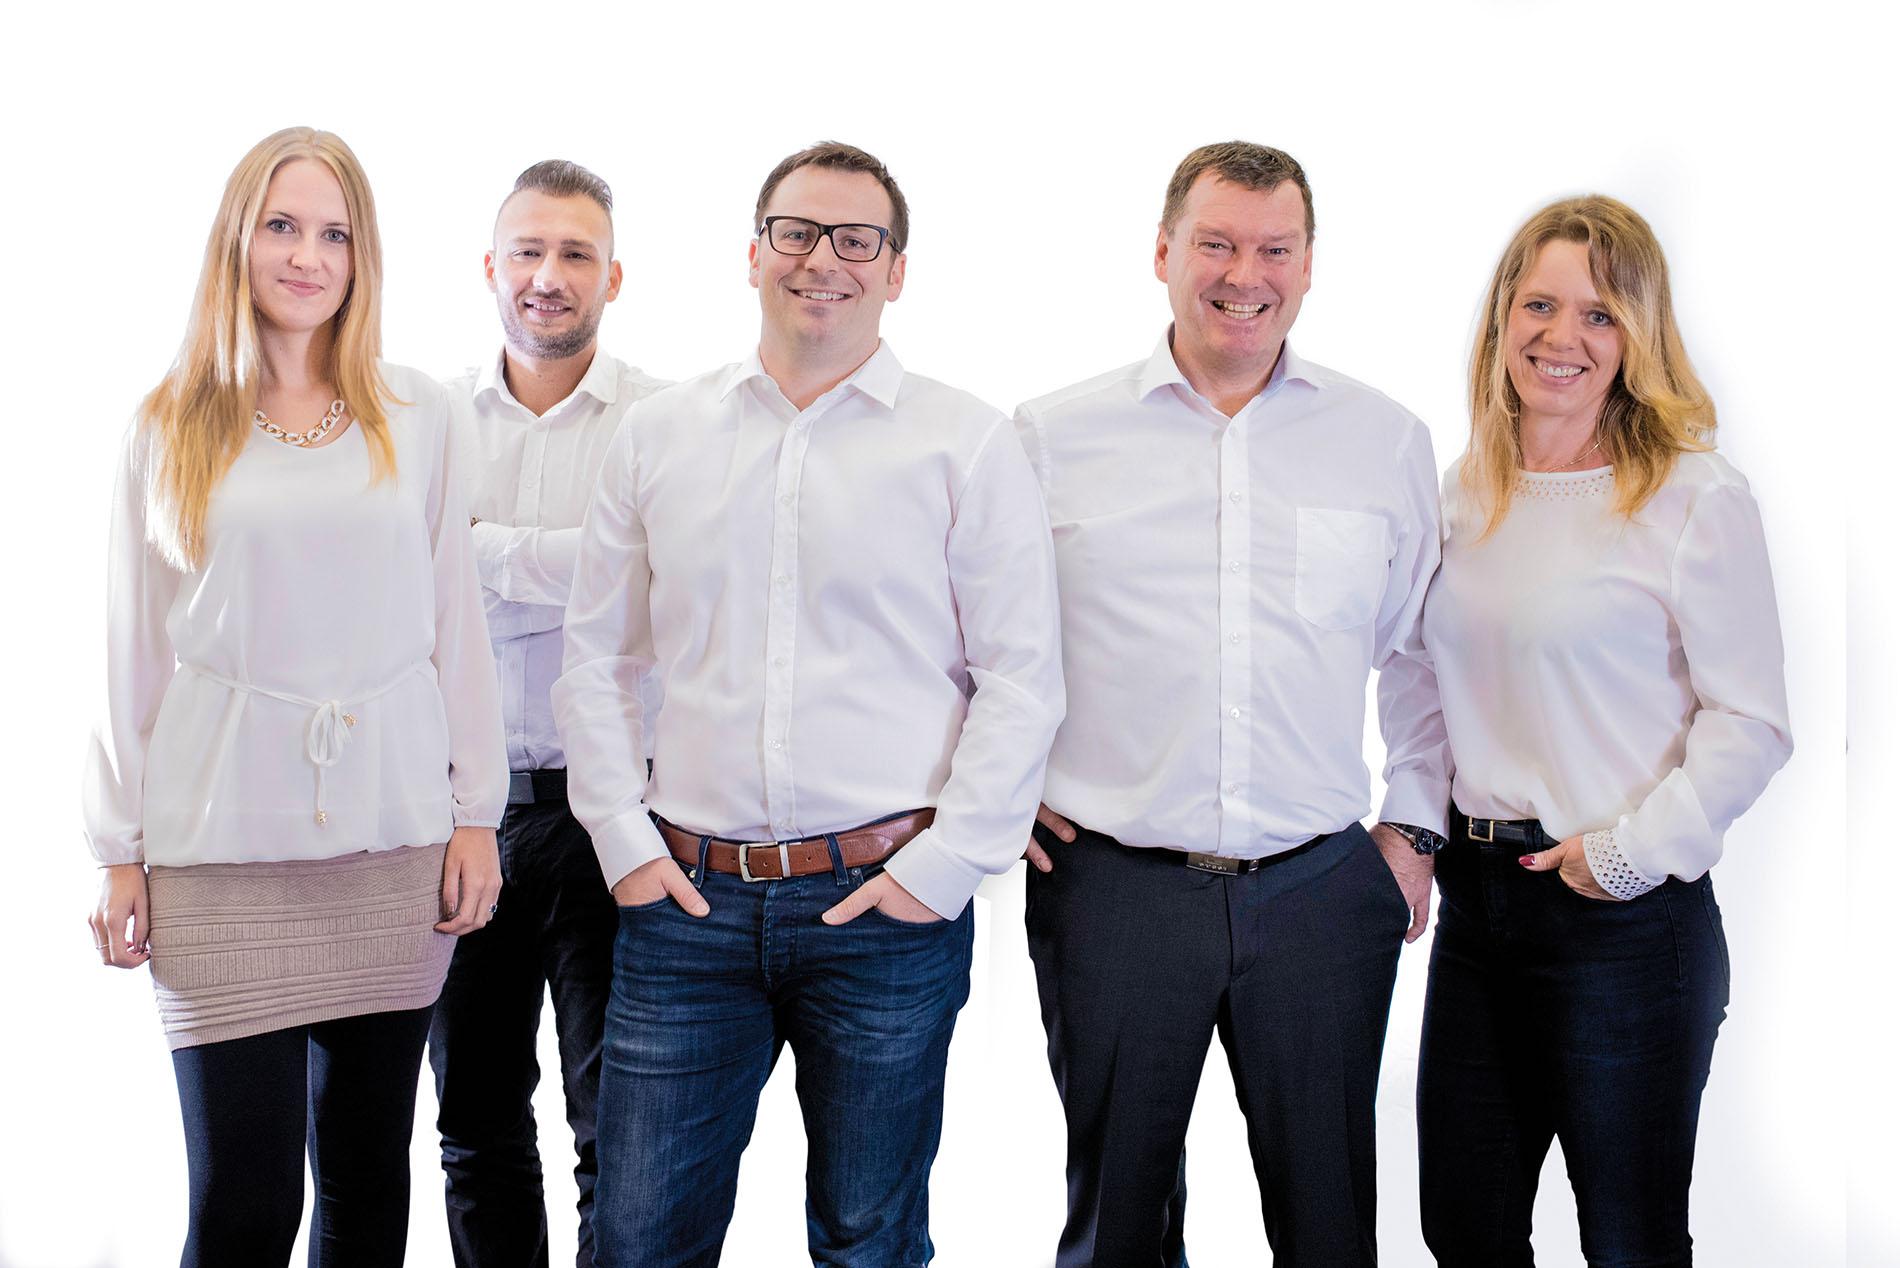 profunda günzburg team